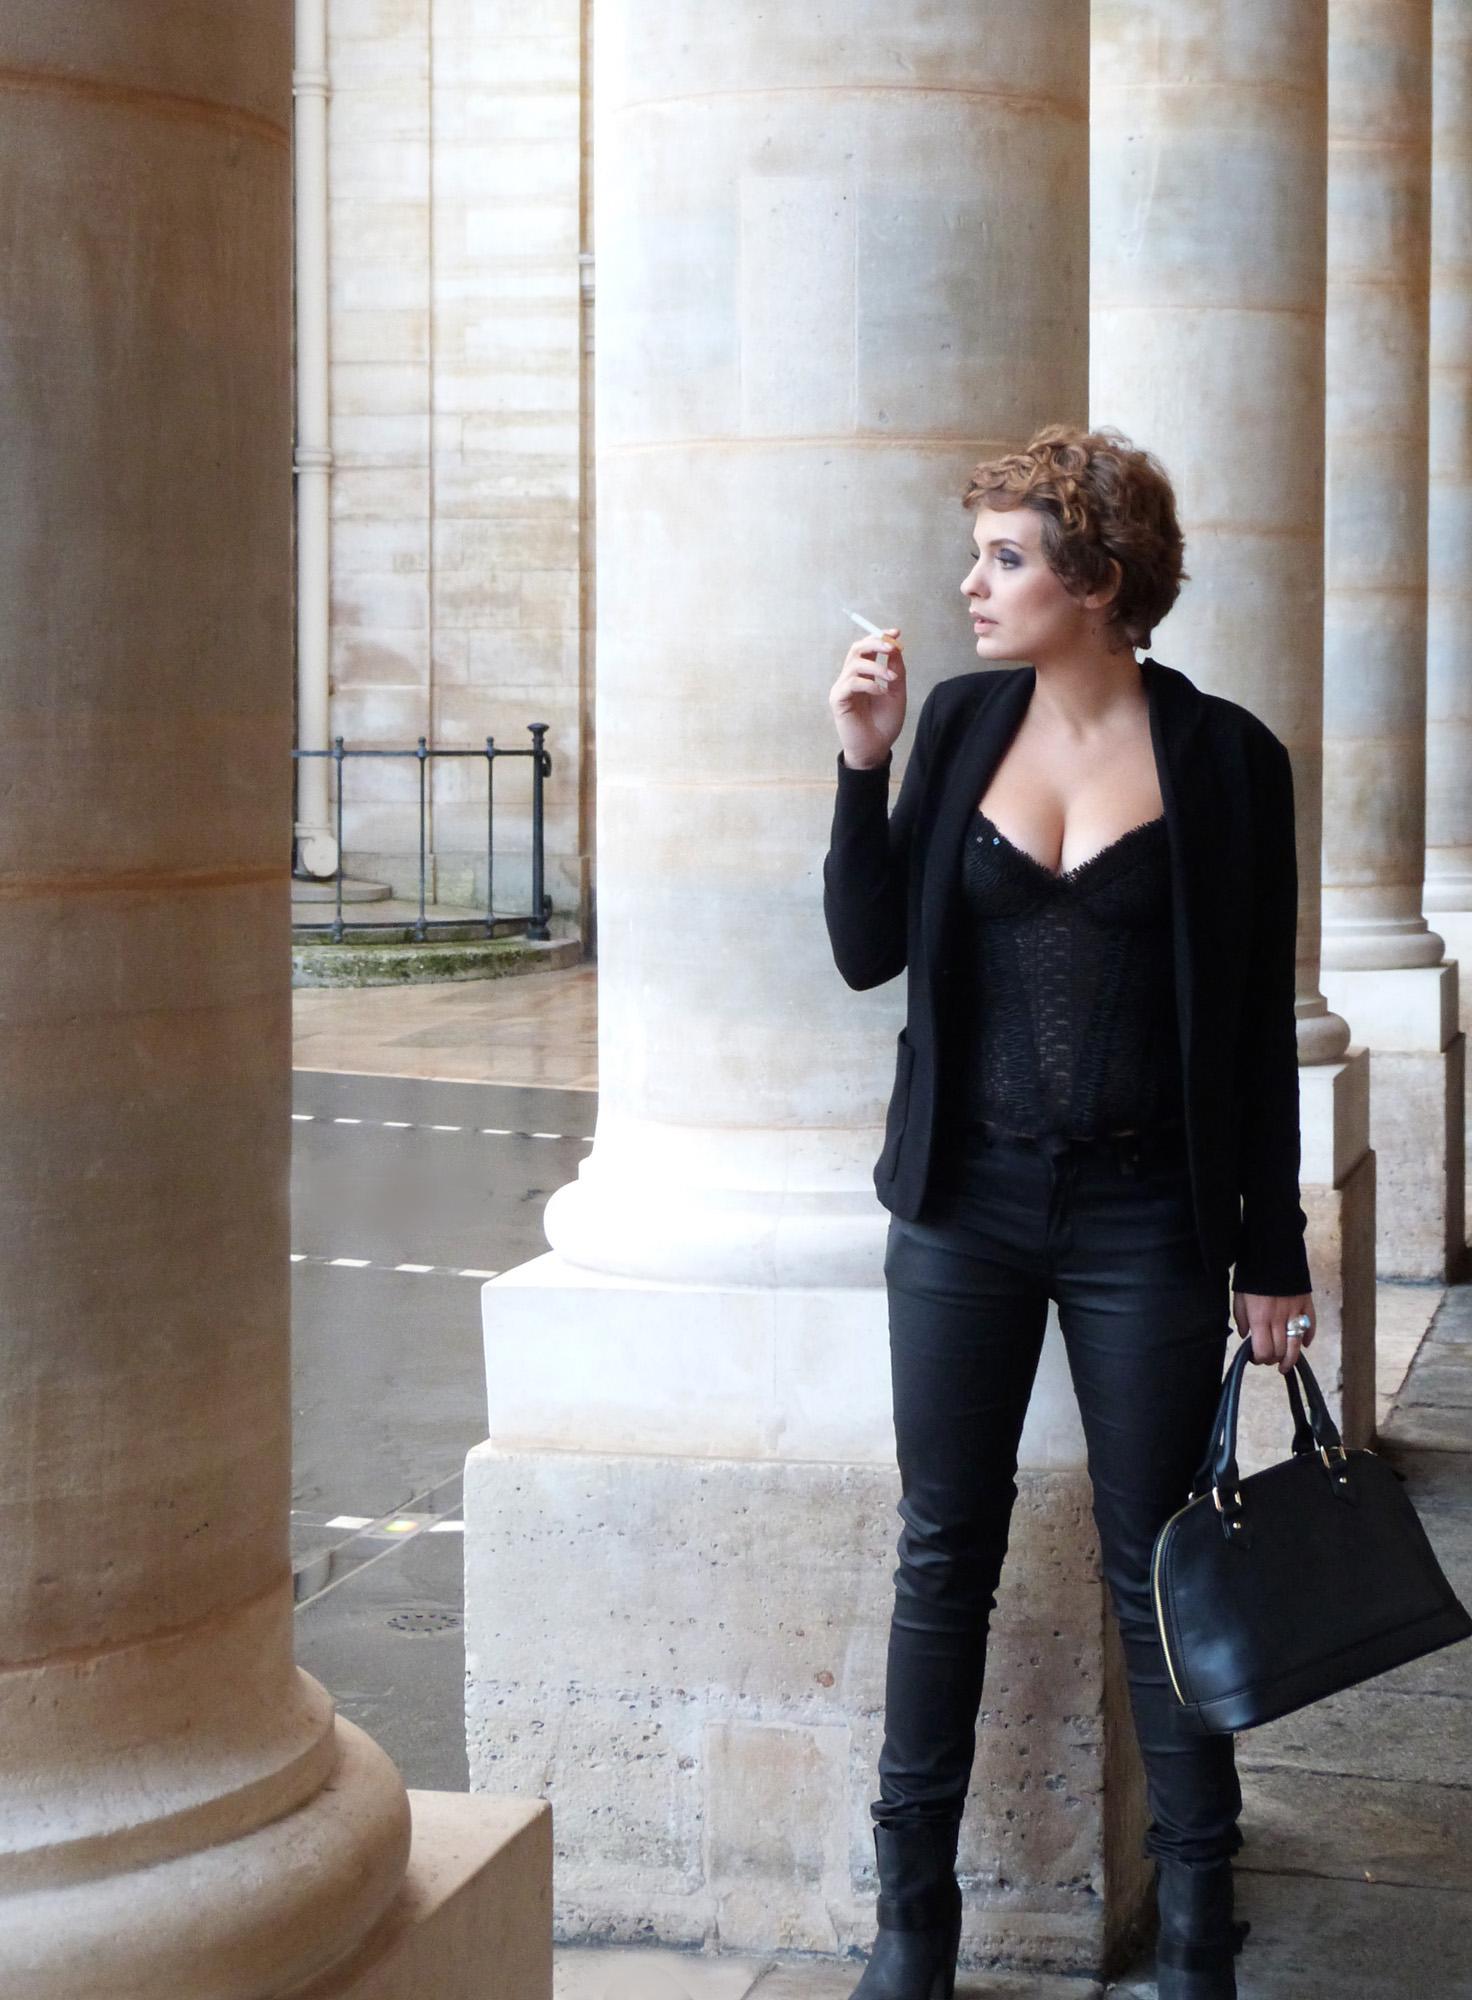 Sarah Ulysse im Spitzenbustier made by entre nous